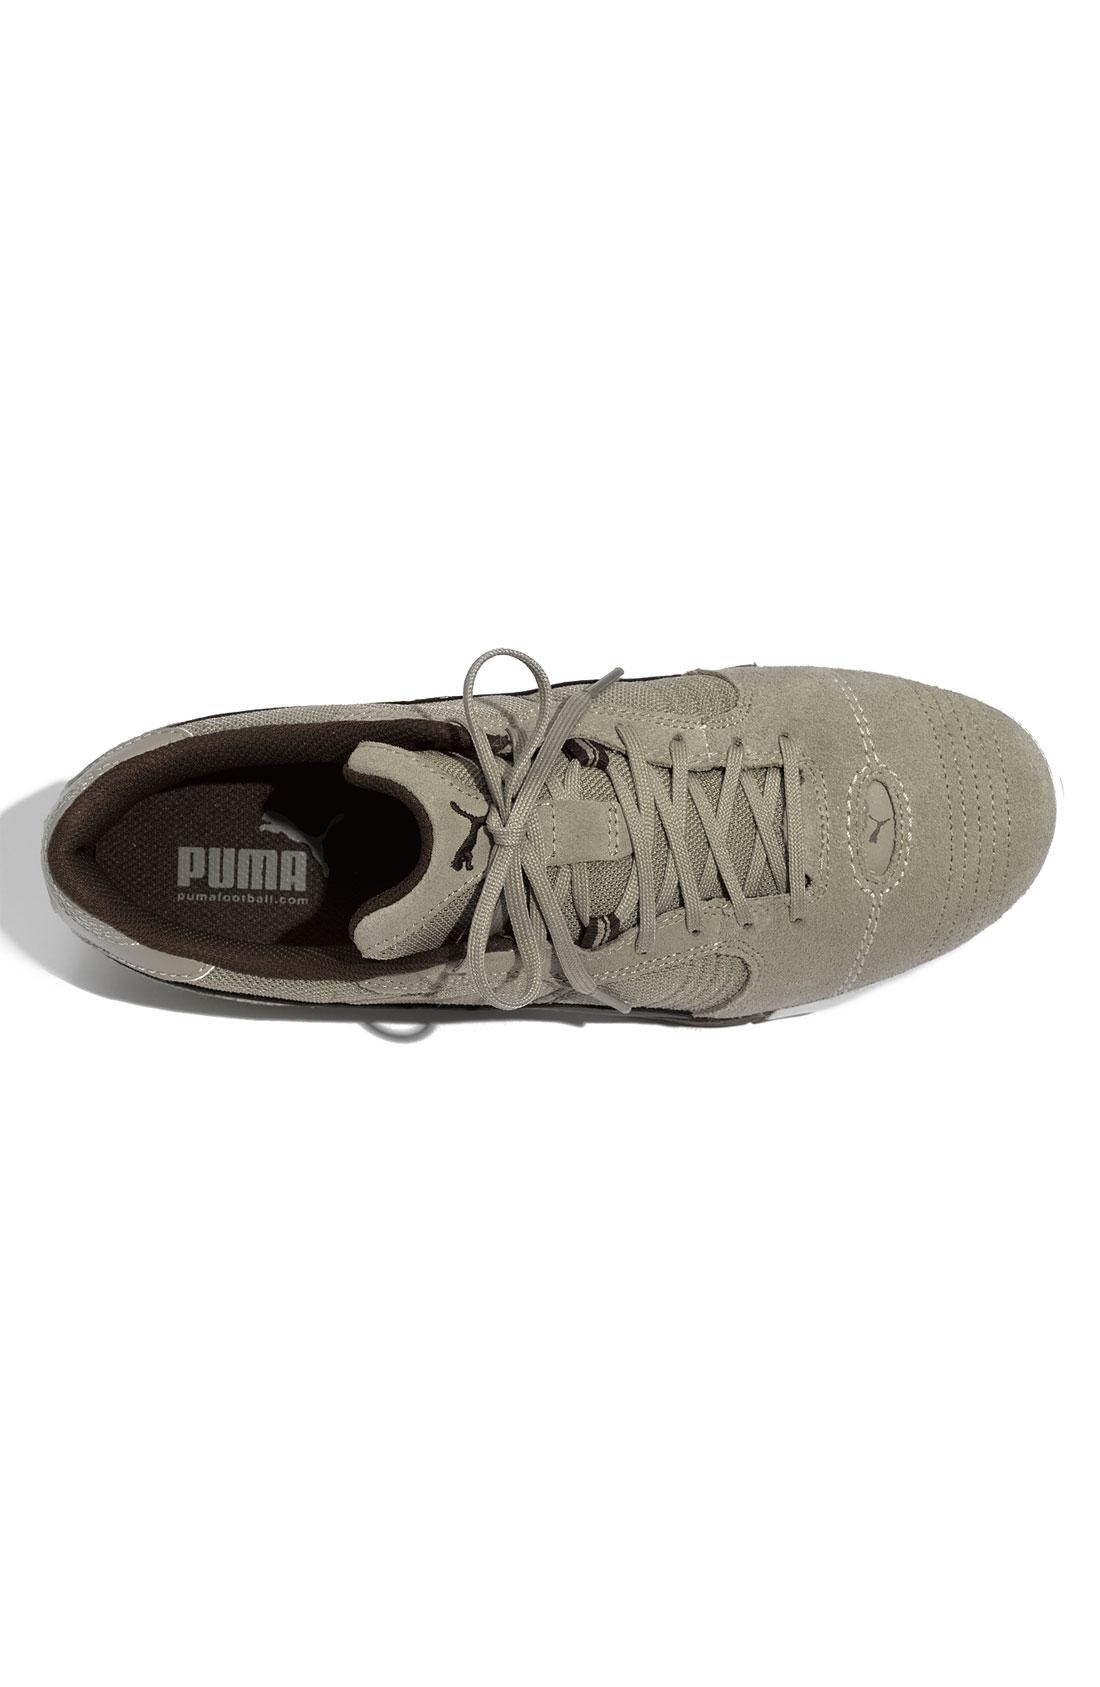 b4a8218bfa7 Puma Gray Esito Lyst For Vulc Men Sneaker In Sala v6Bqx1d